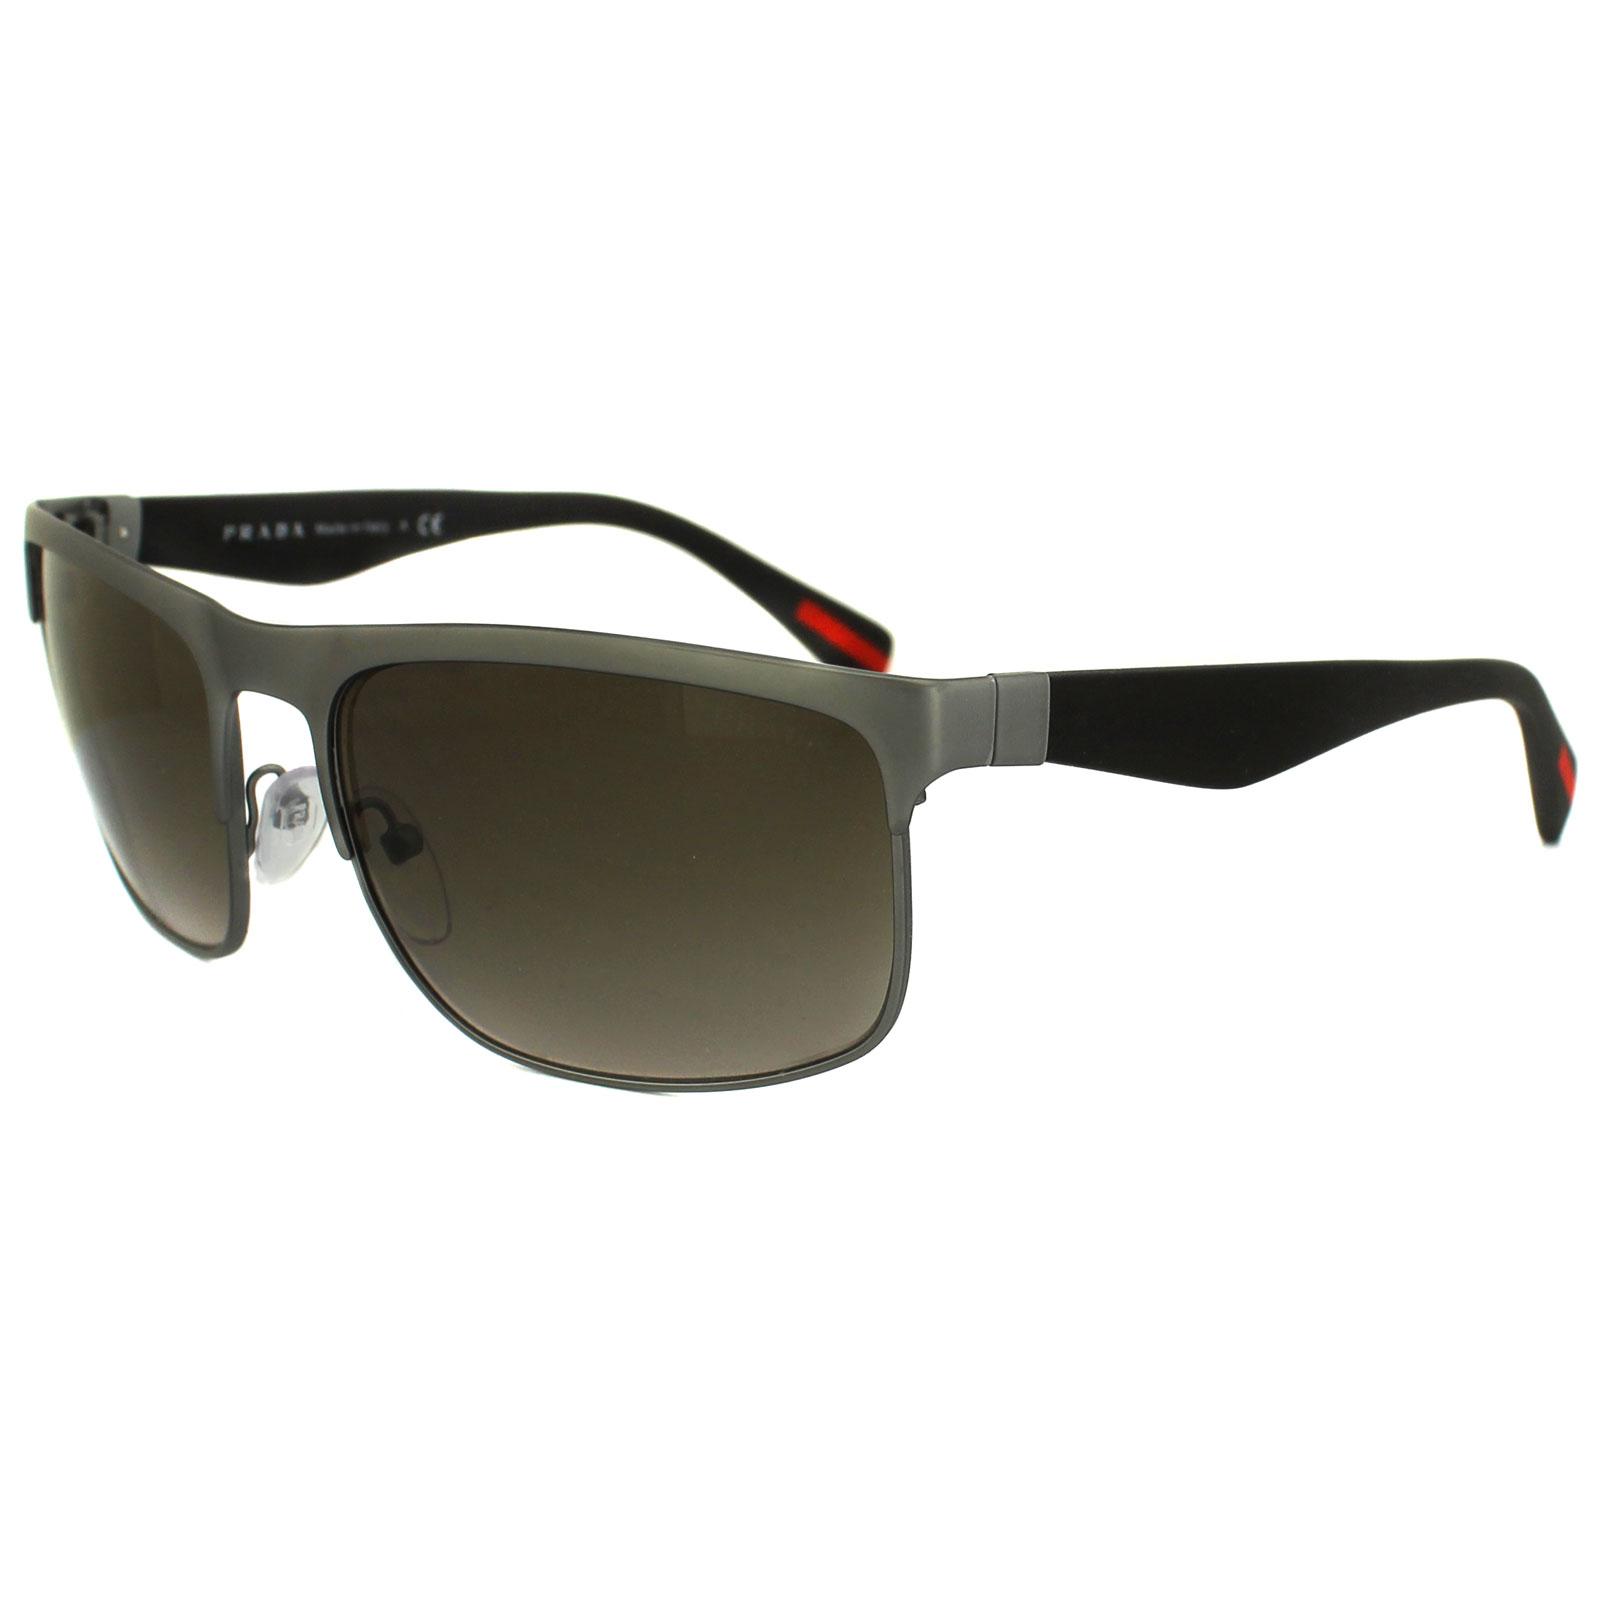 d5ded99d5eceb Sentinel Prada Sport Sunglasses 56PS DG11X1 Rubber Gunmetal Brown Gradient